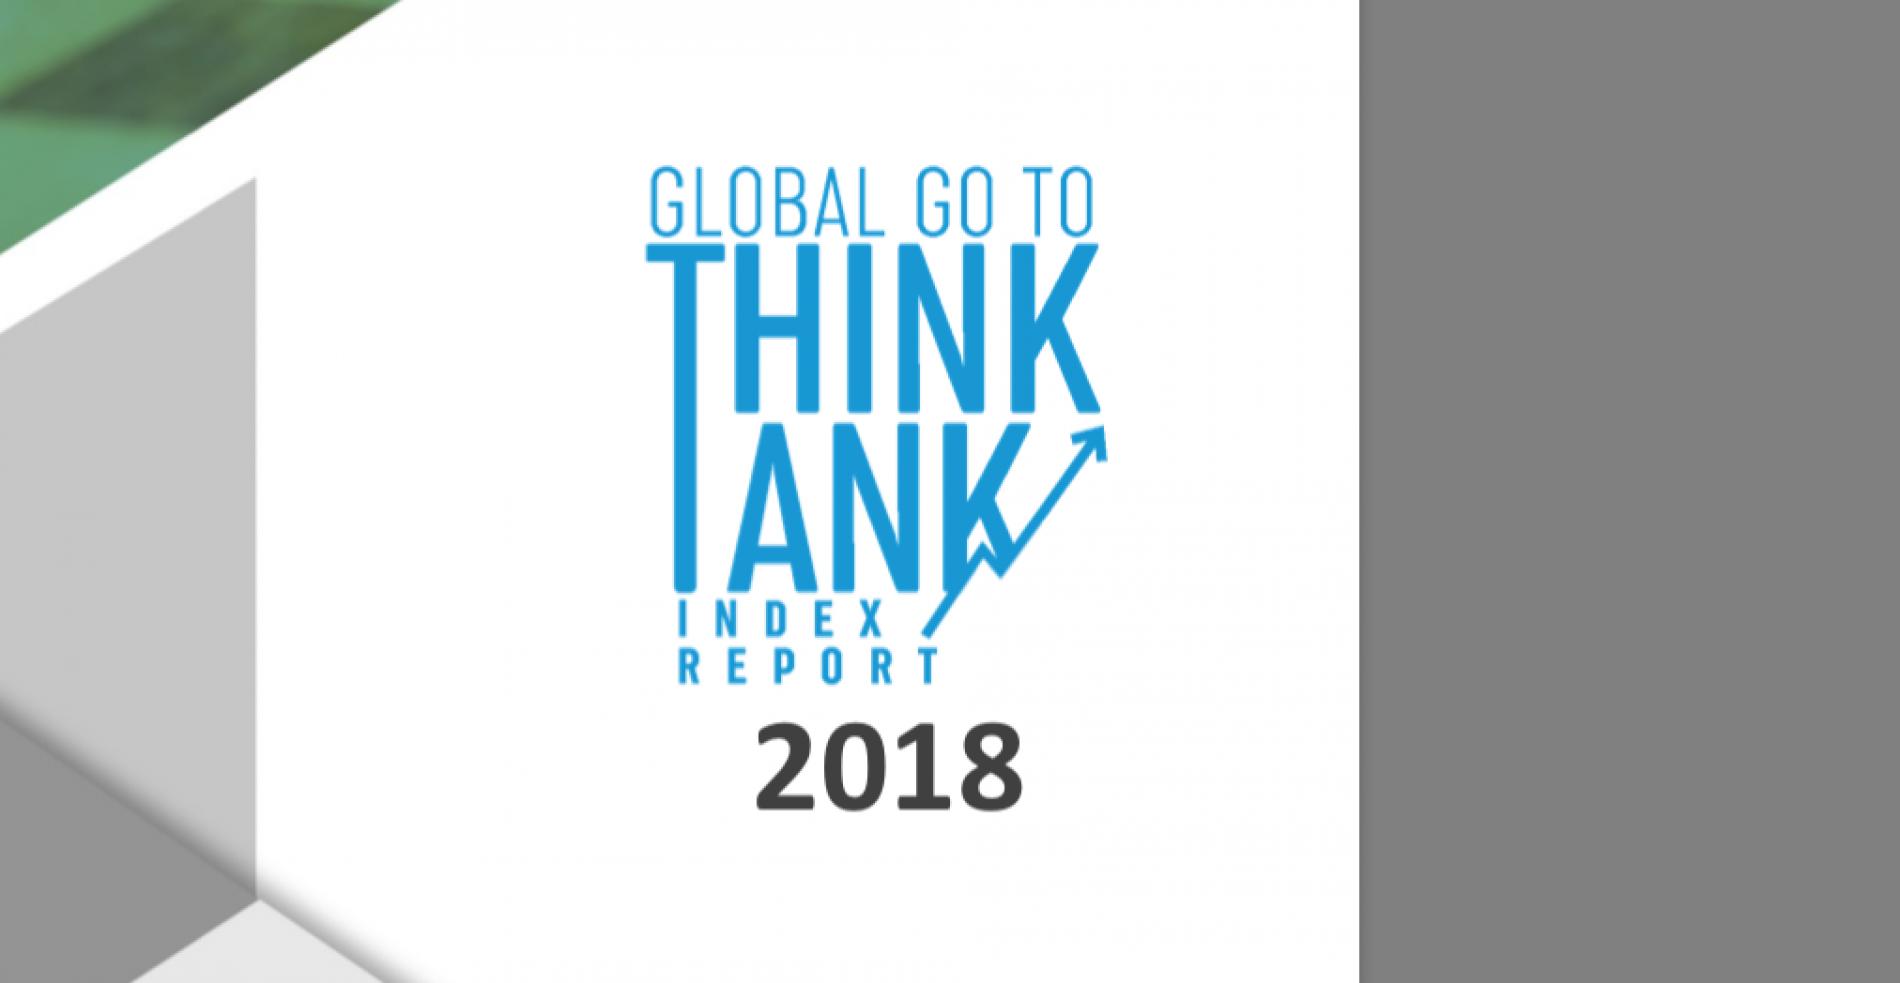 Puesto 18 en el Global Think Tanks Index